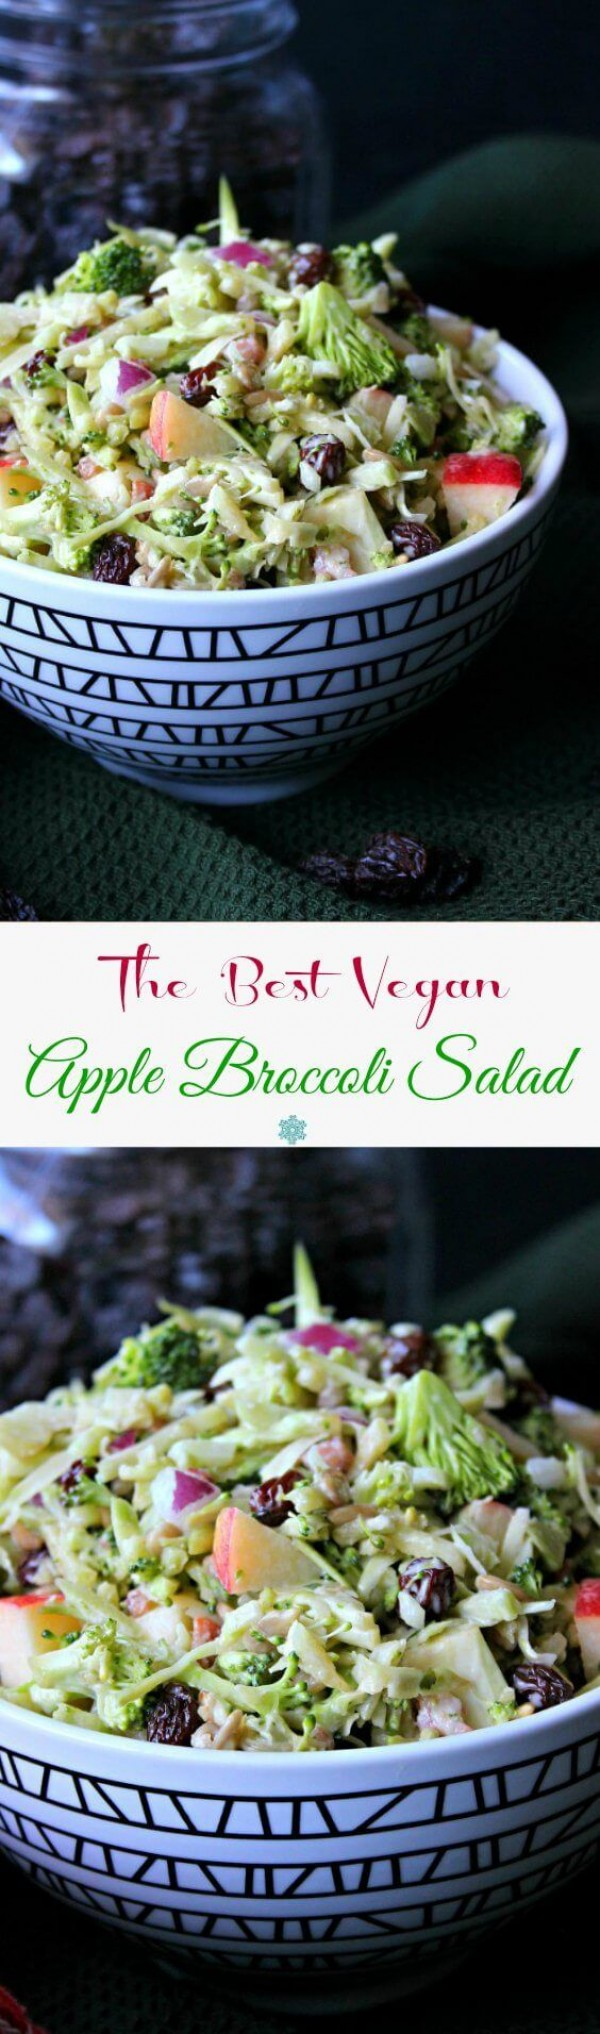 Get the recipe Apple Broccoli Salad @recipes_to_go